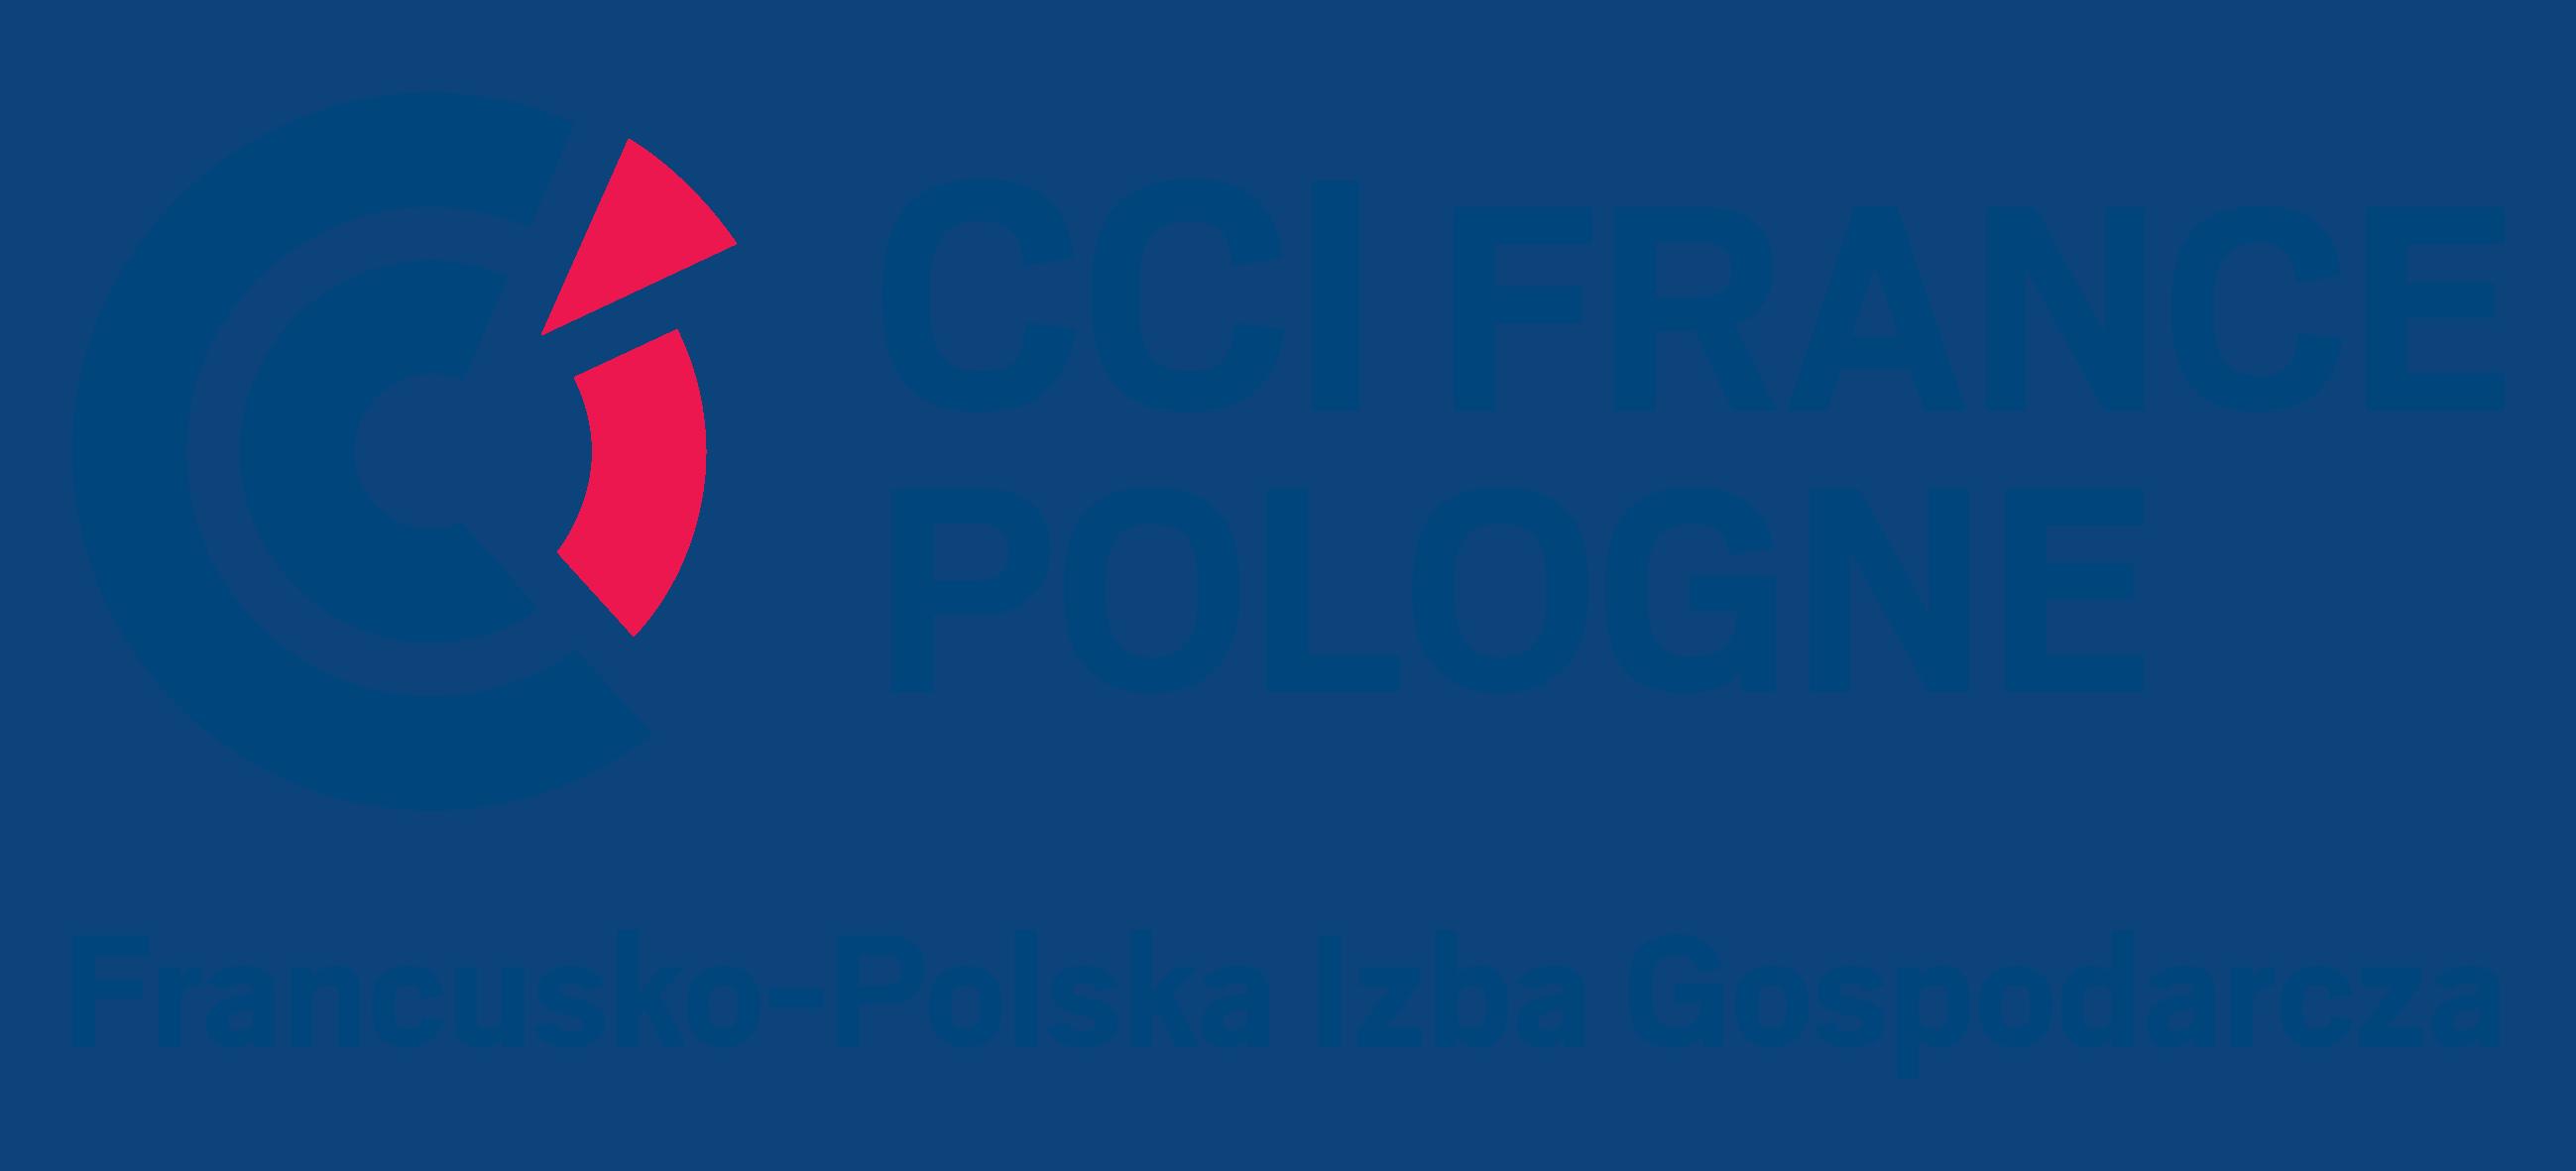 partnerzy eurofiscalis ccifp logo